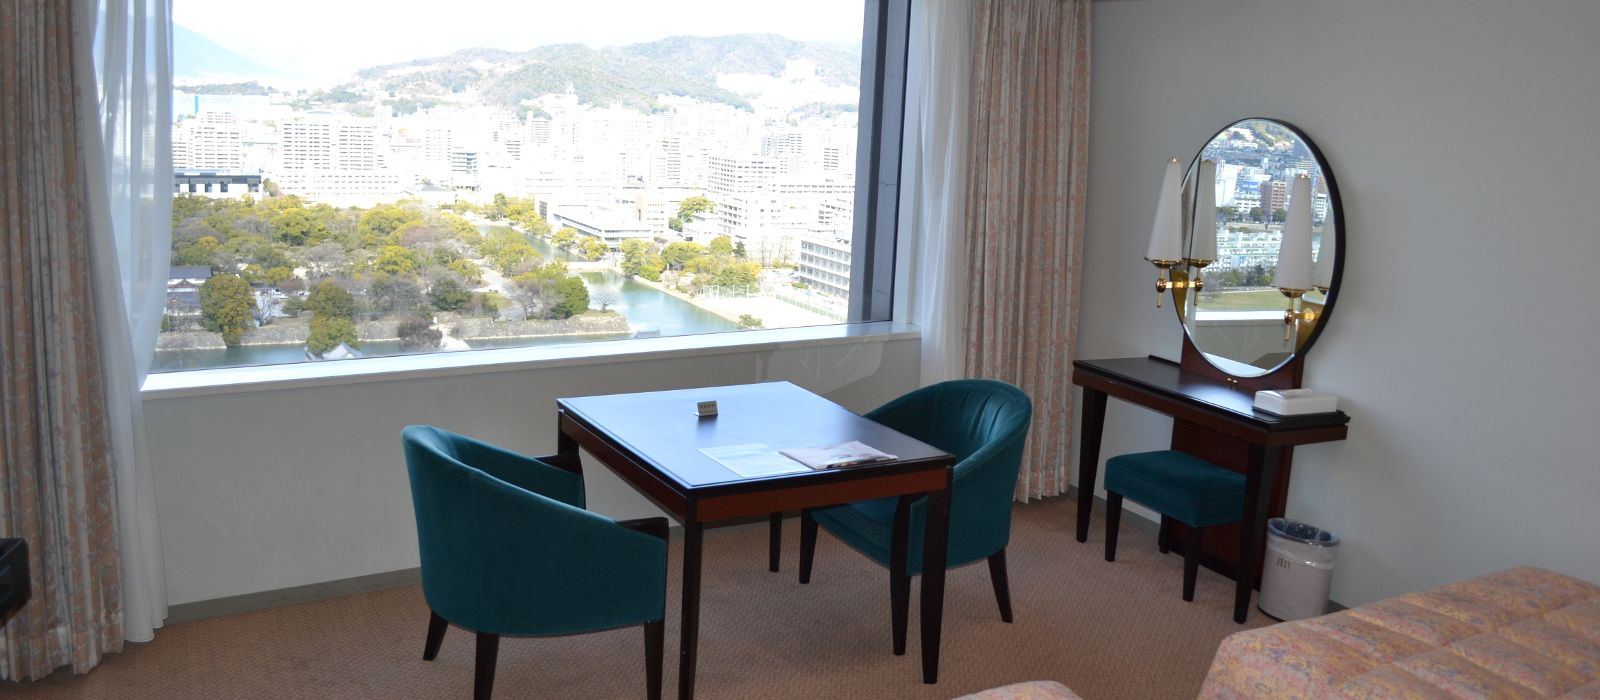 Hotel Rihga Royal Hiroshima Japan